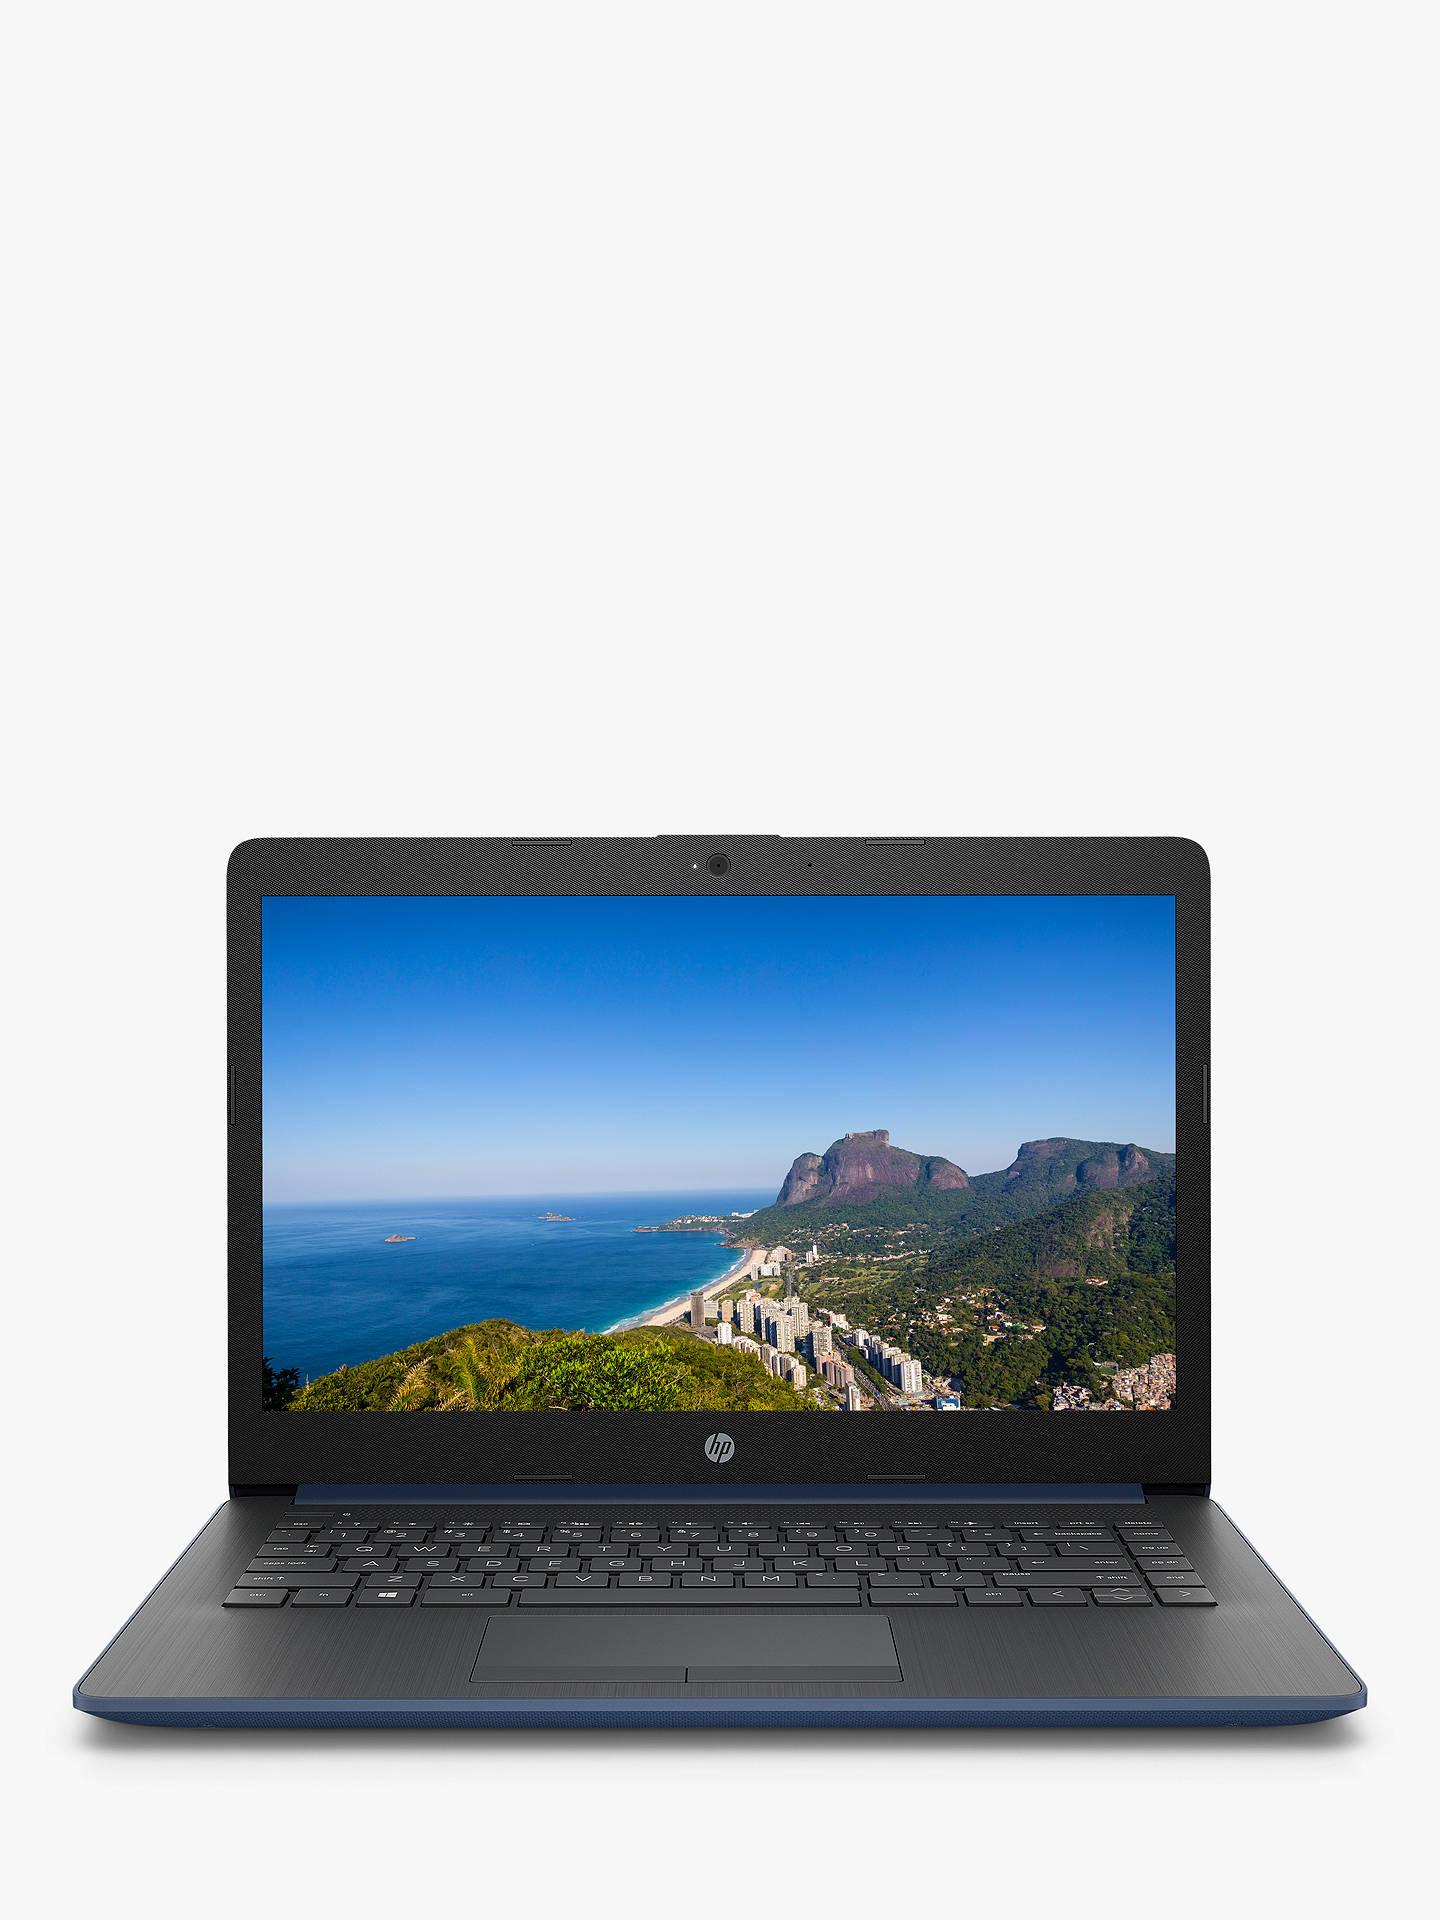 Hp Stream 14 Cm0038na Laptop Amd A4 Processor 4gb Ram 64gb Emmc 14 Twilight Blue At John Lewis Partners